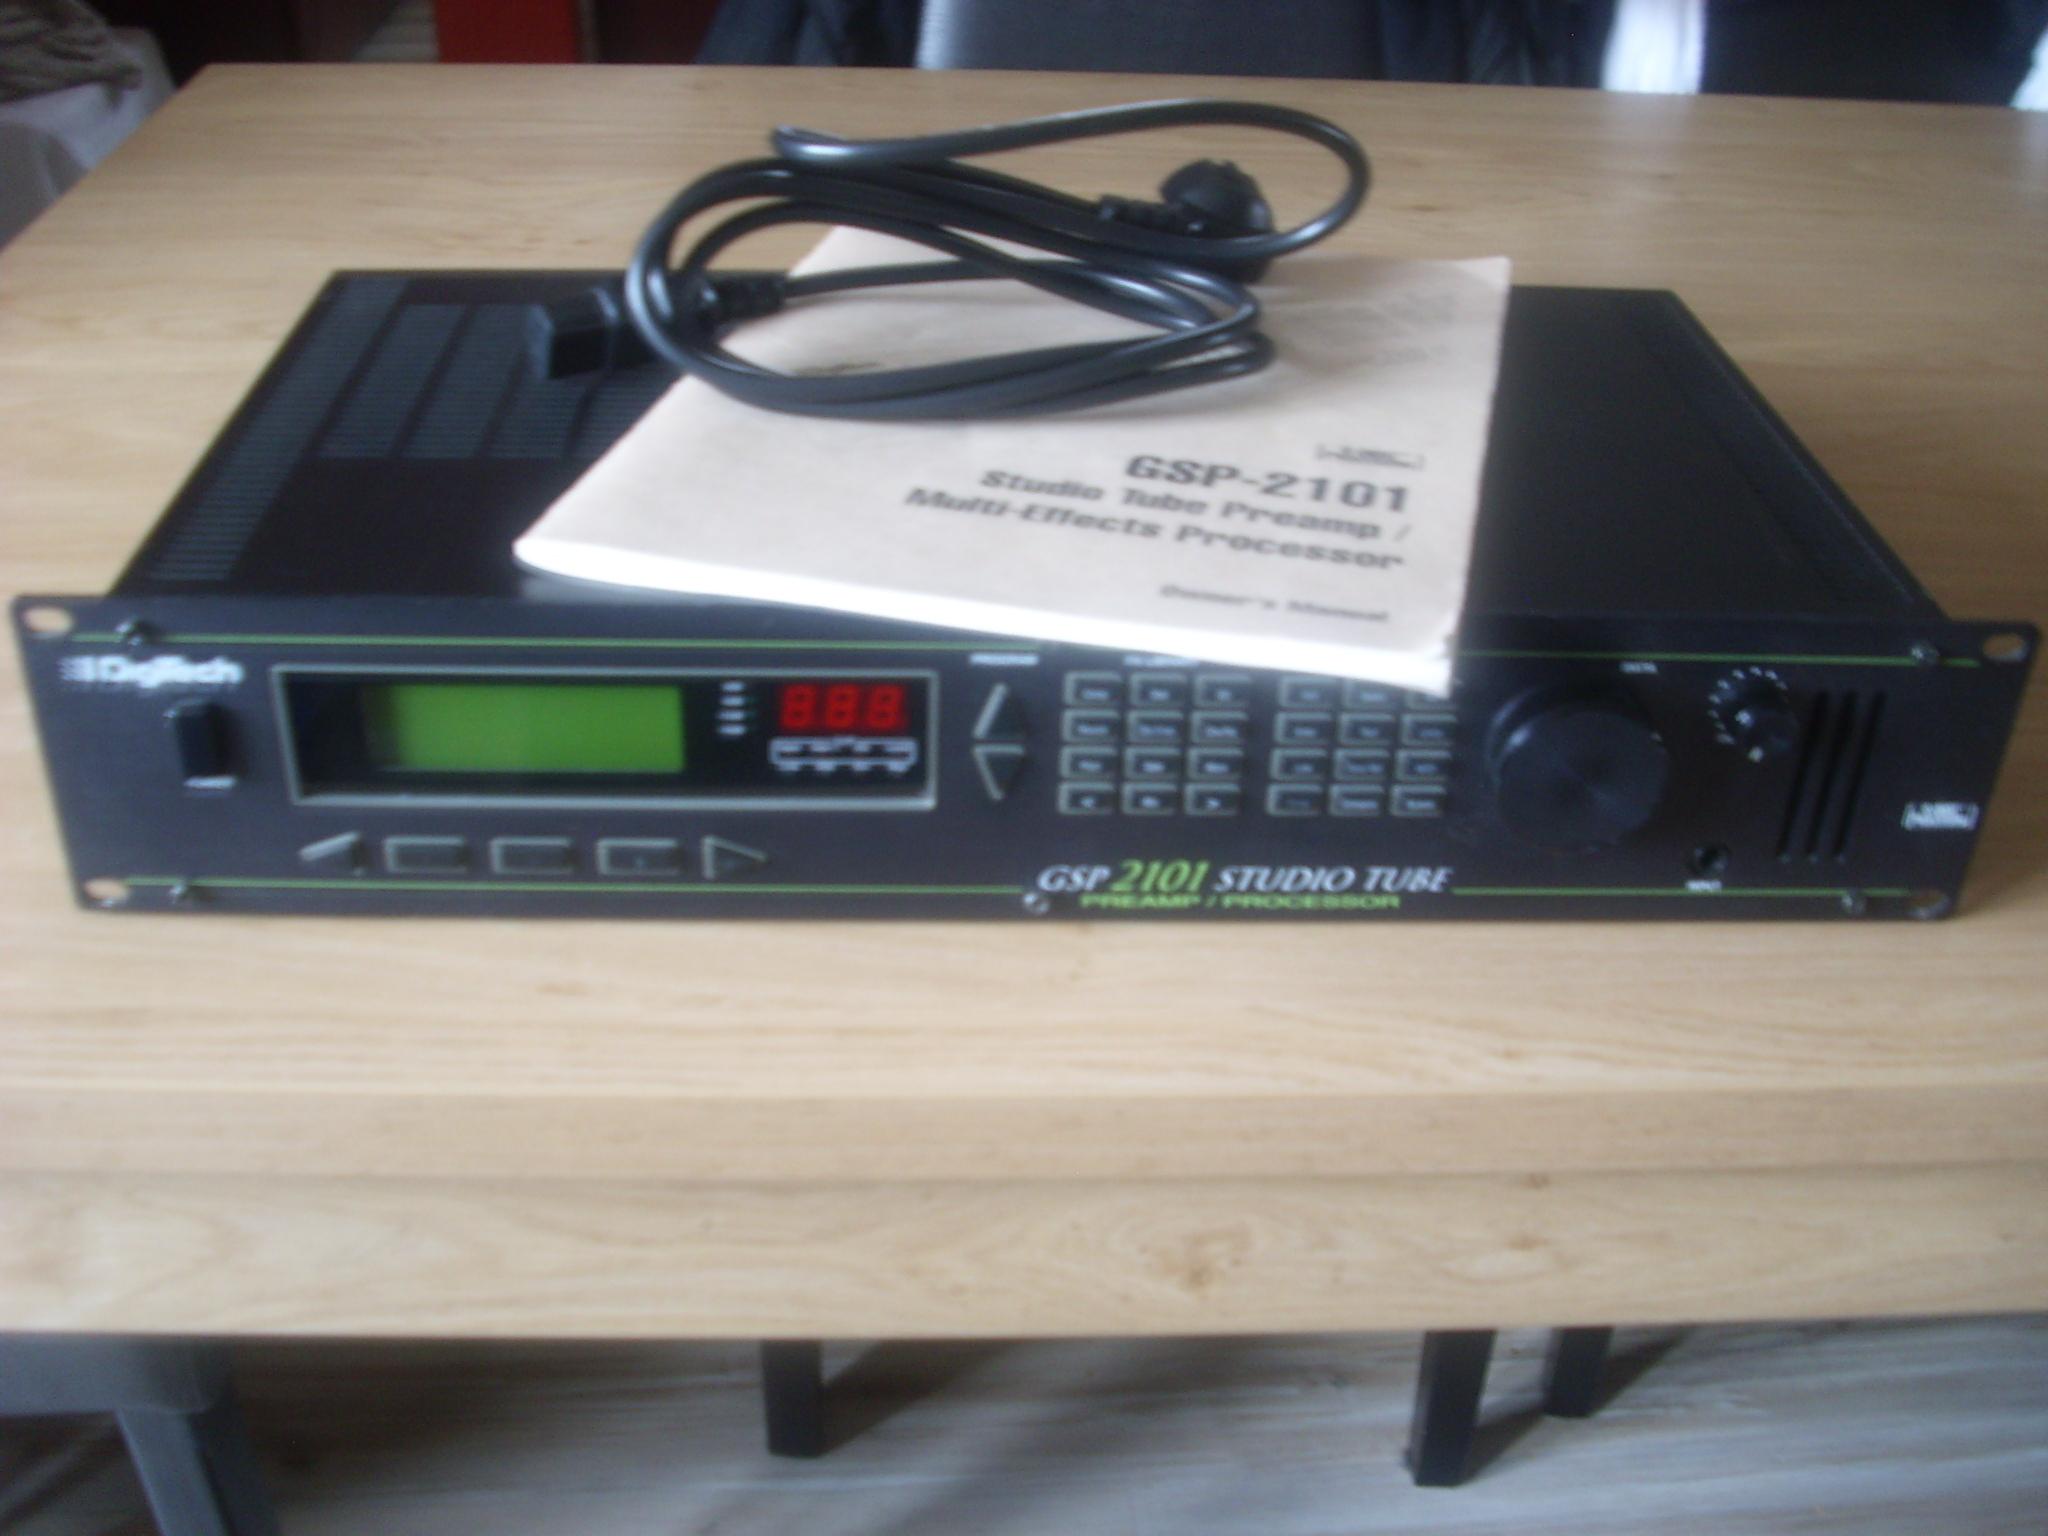 Digitech Gsp 2101 Manual